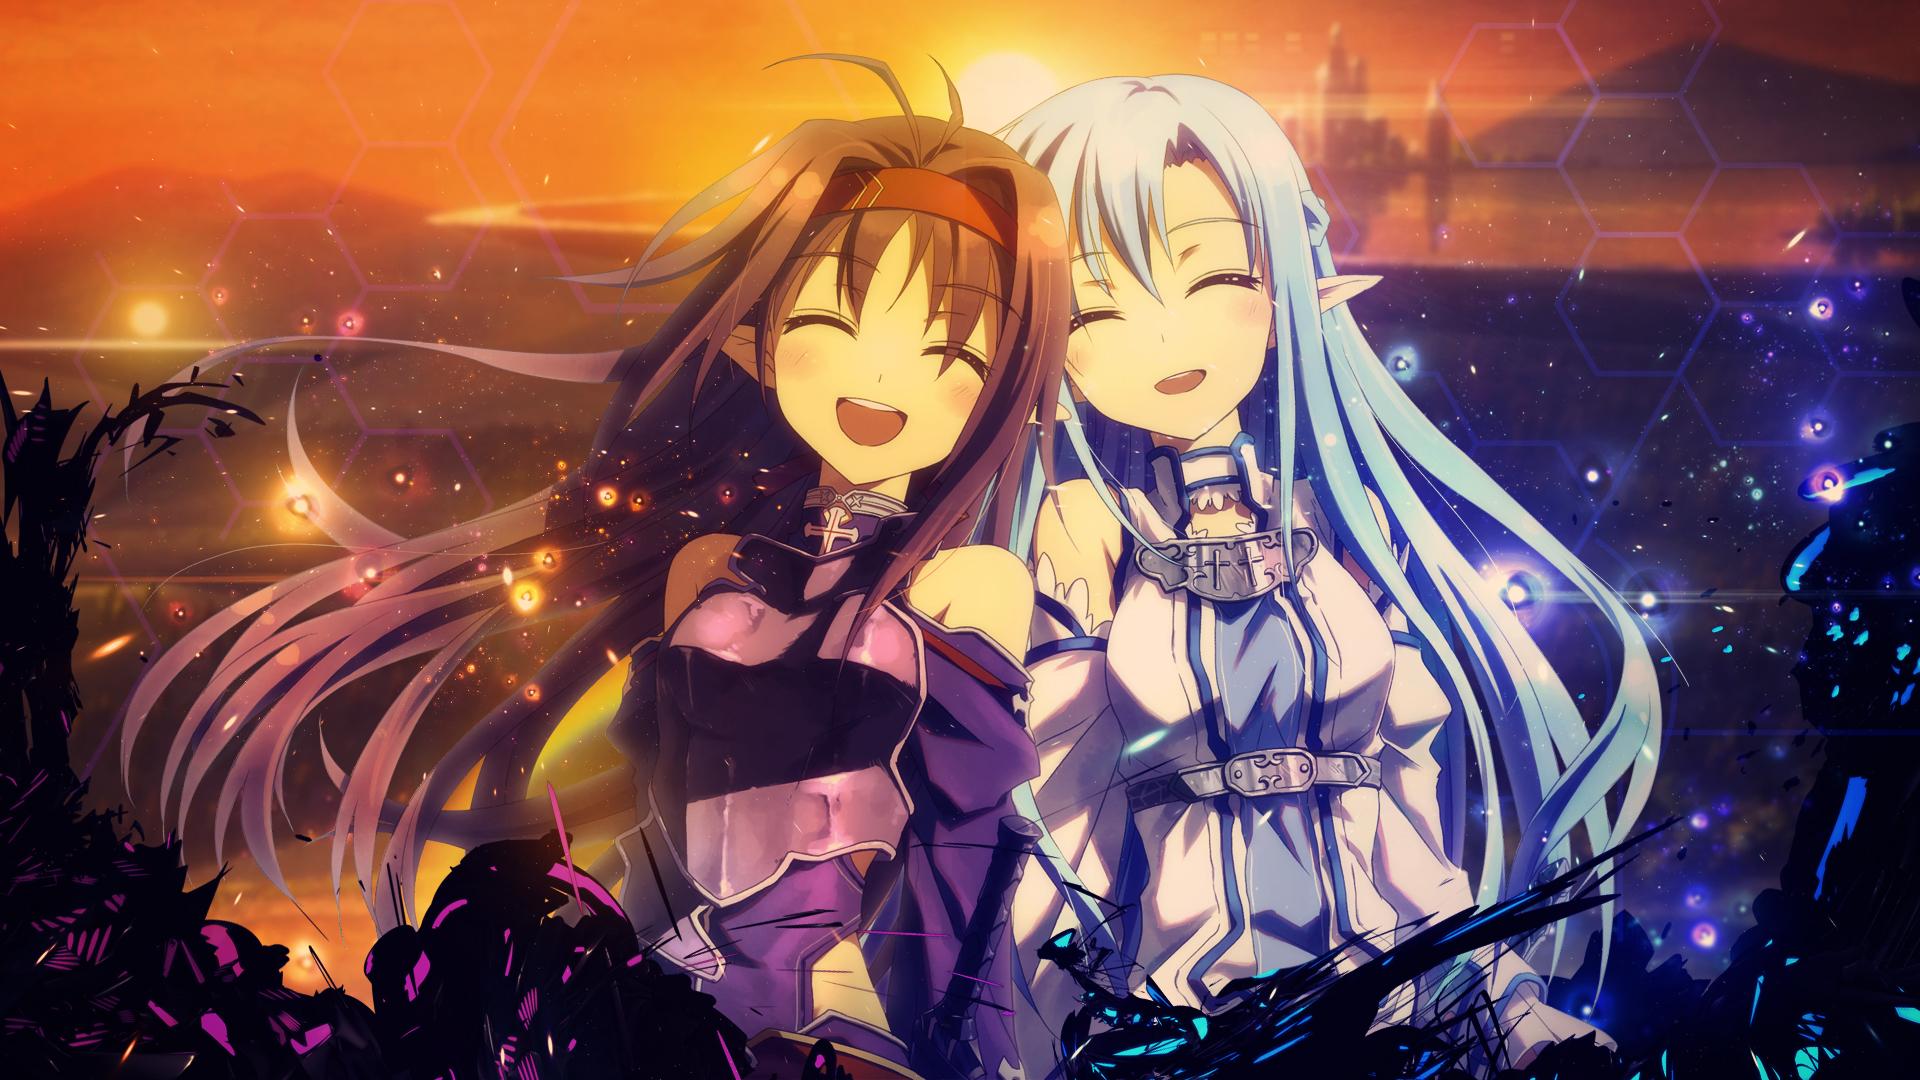 Sword Art Online Asuna And Yuuki Wallpaper By Trinexz On Deviantart